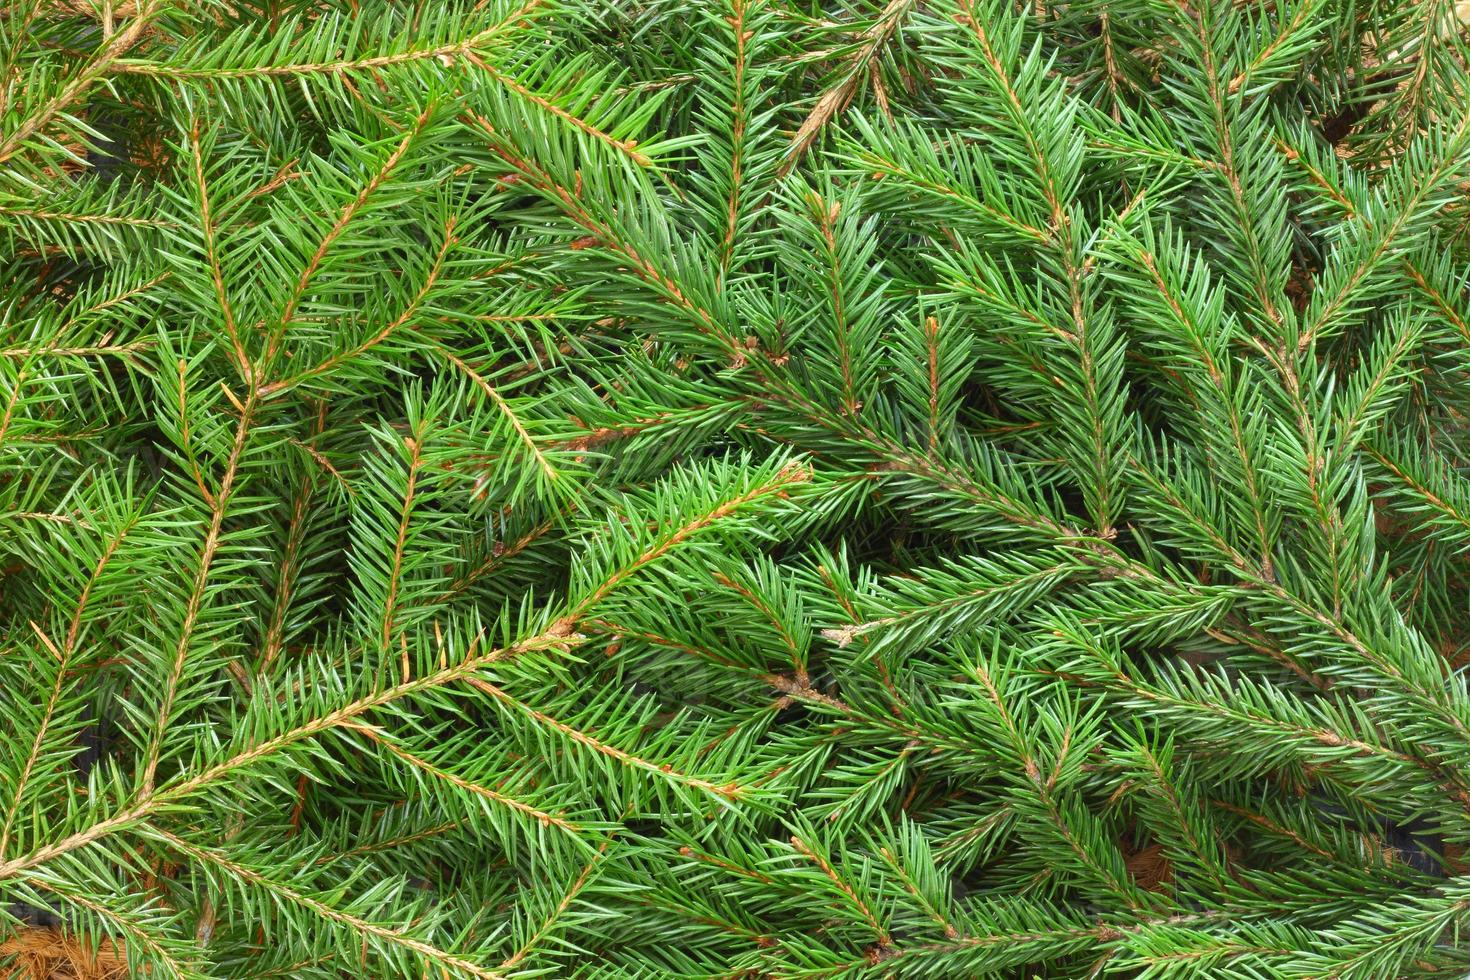 Fir tree background photo